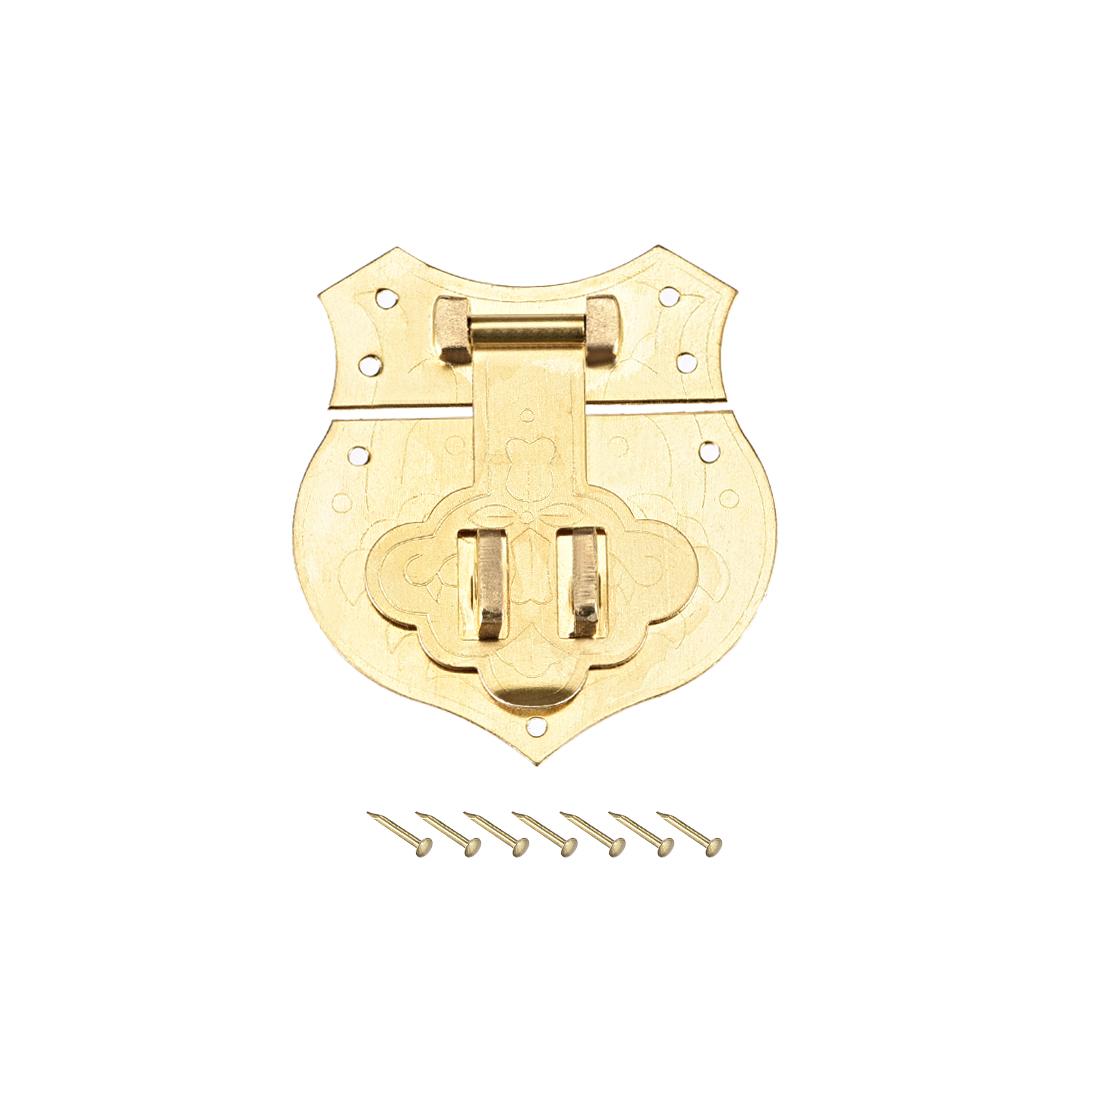 Wood Case Box Hasp 40x43mm Closure Brass Antique Latches Yellow